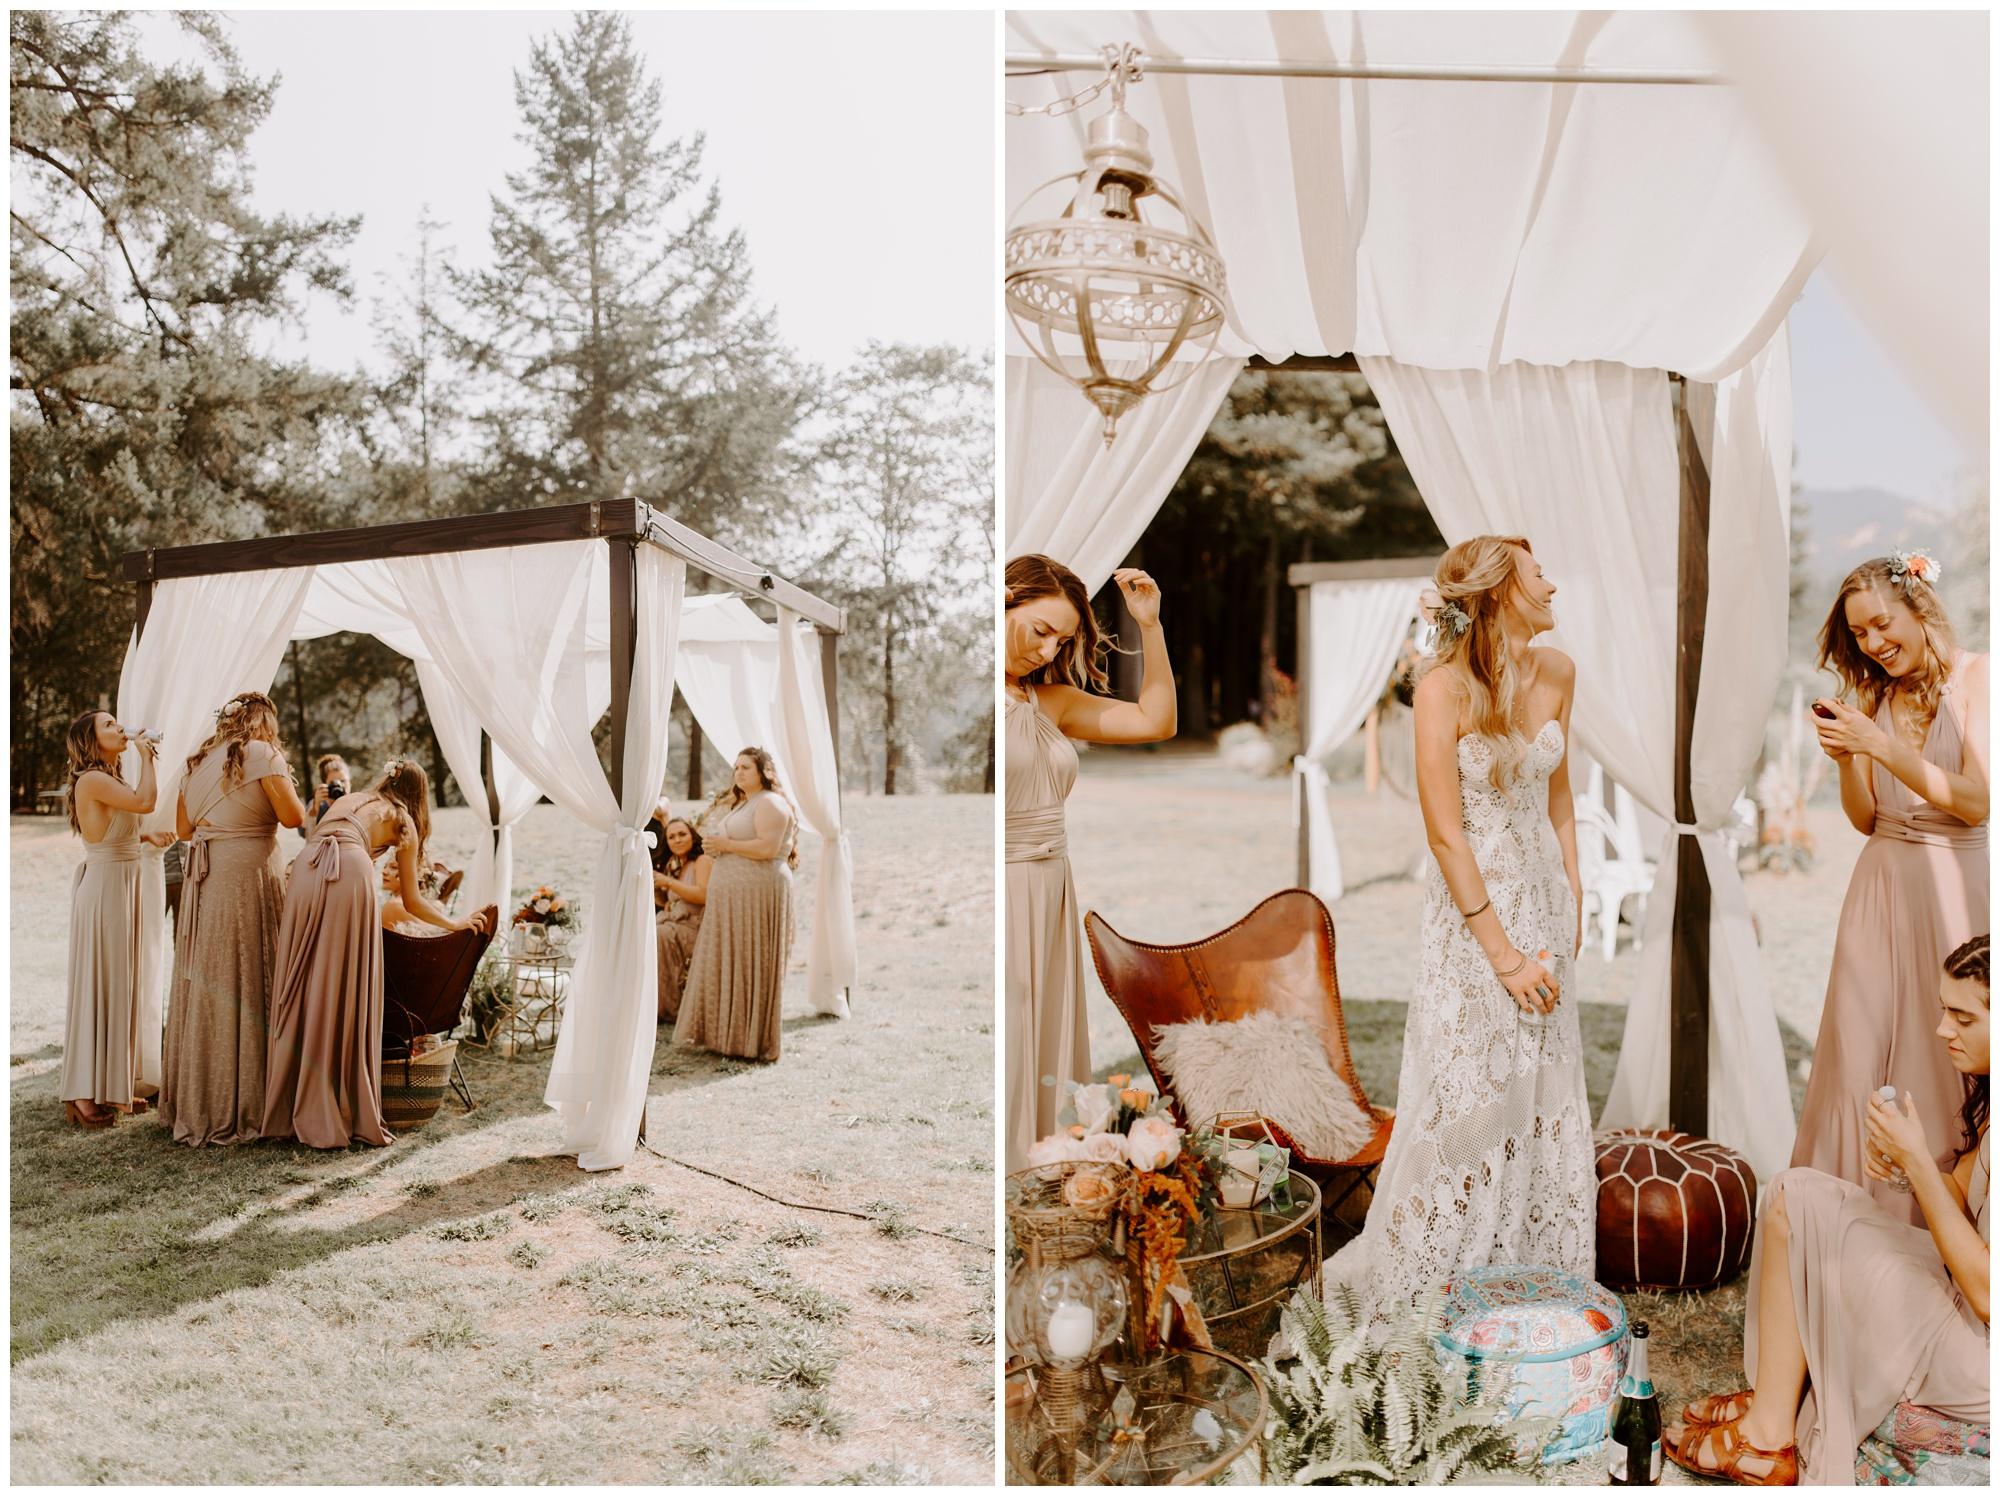 Redwood Festival Wedding Humbolt California - Jessica Heron Images_0017.jpg